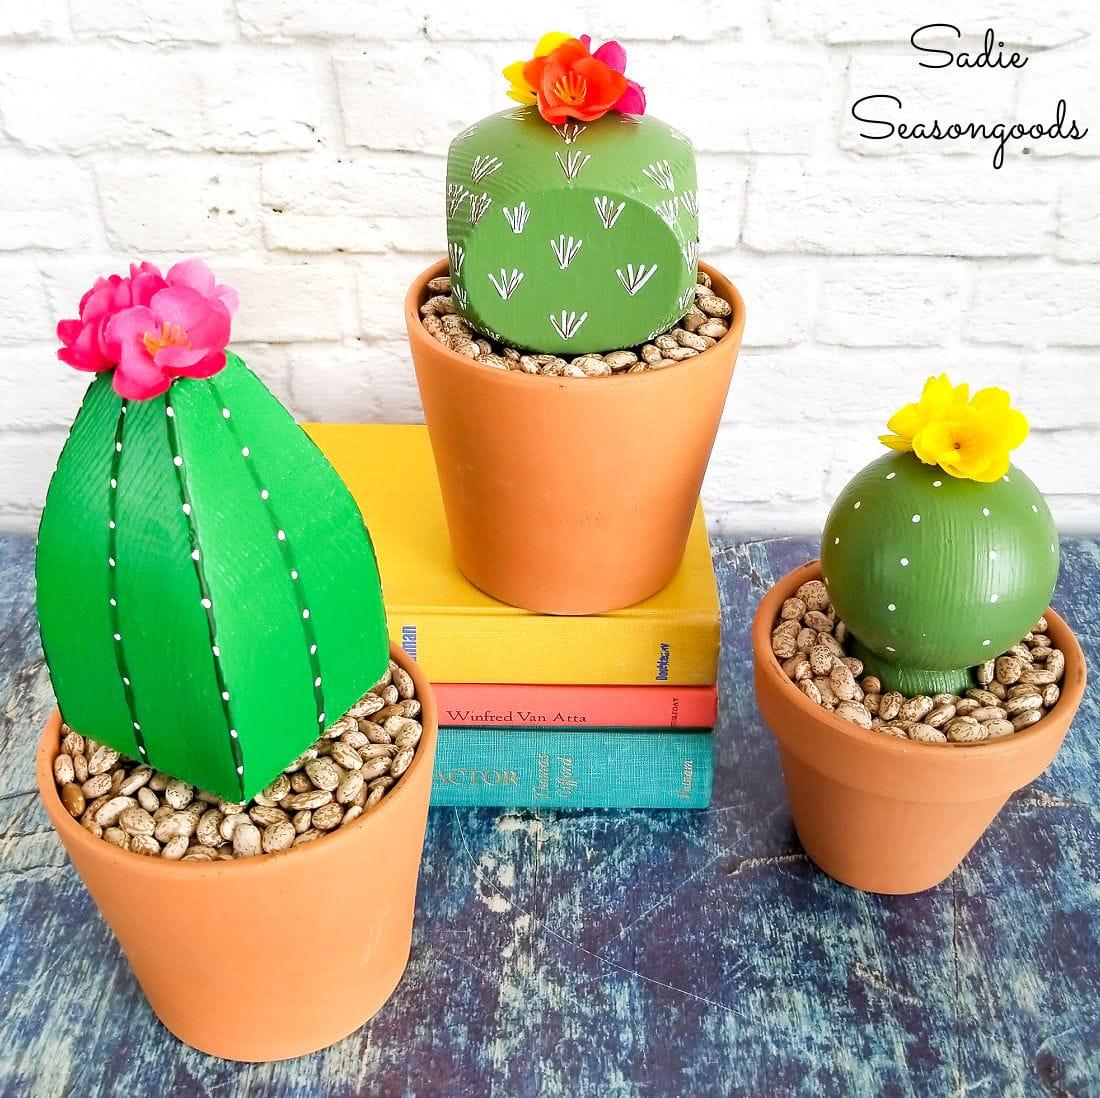 Wooden cactus decor